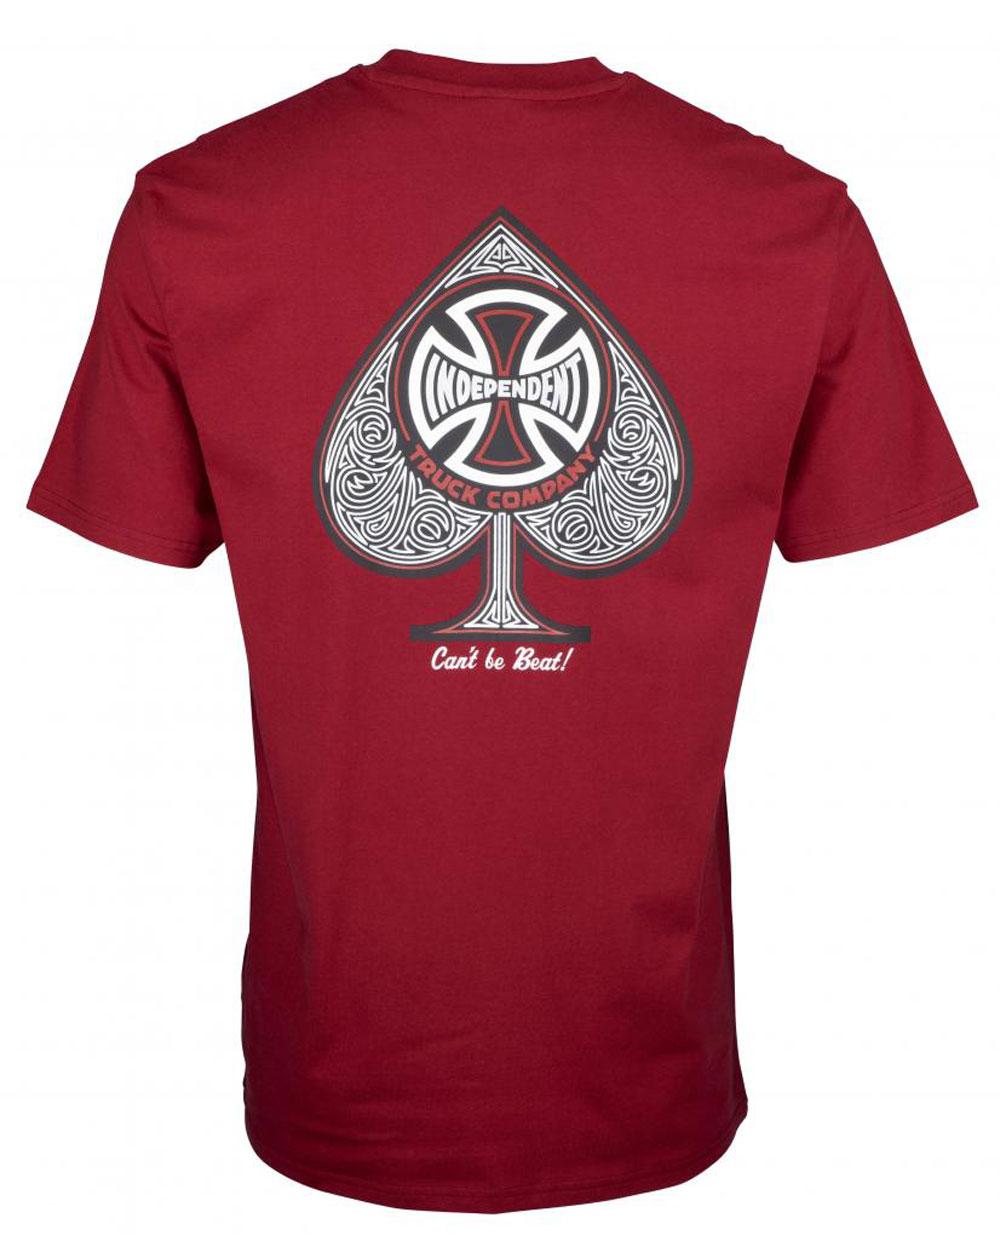 Independent CBB Cross Spade T-Shirt Uomo Maroon